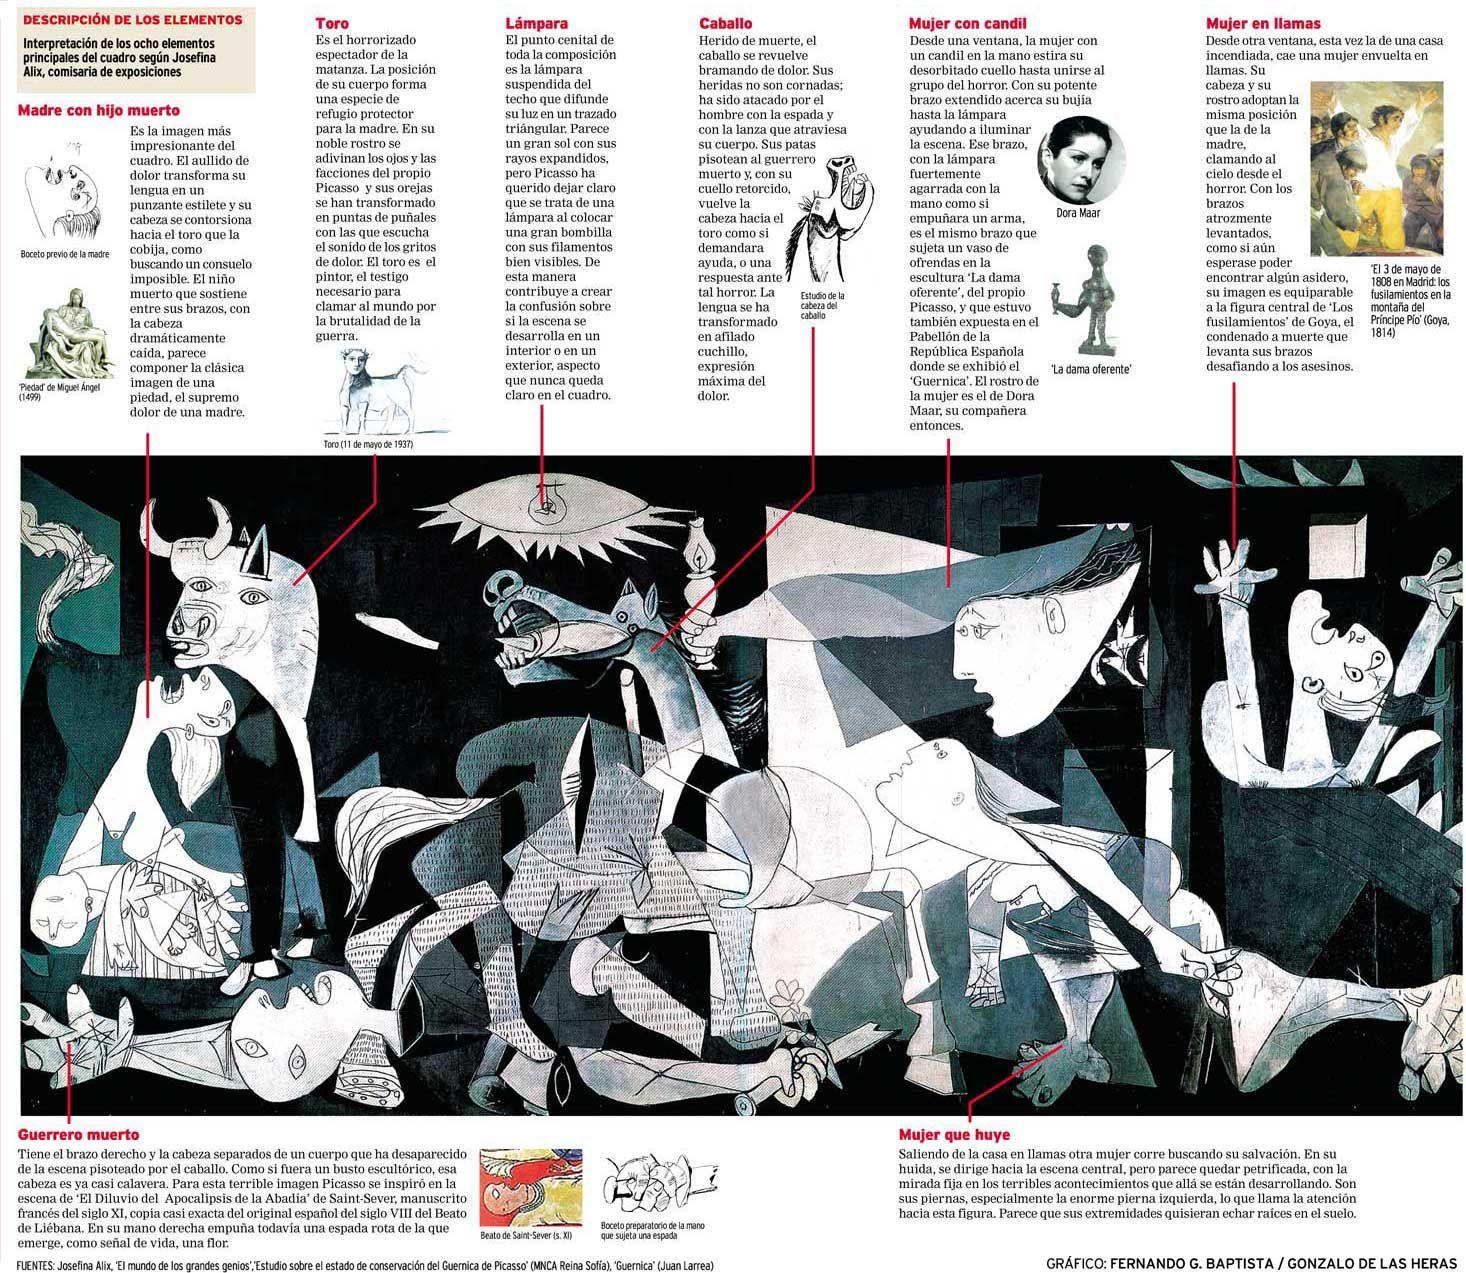 Informacion Detallada De Guernica Pintado Por Pablo Picasso Con